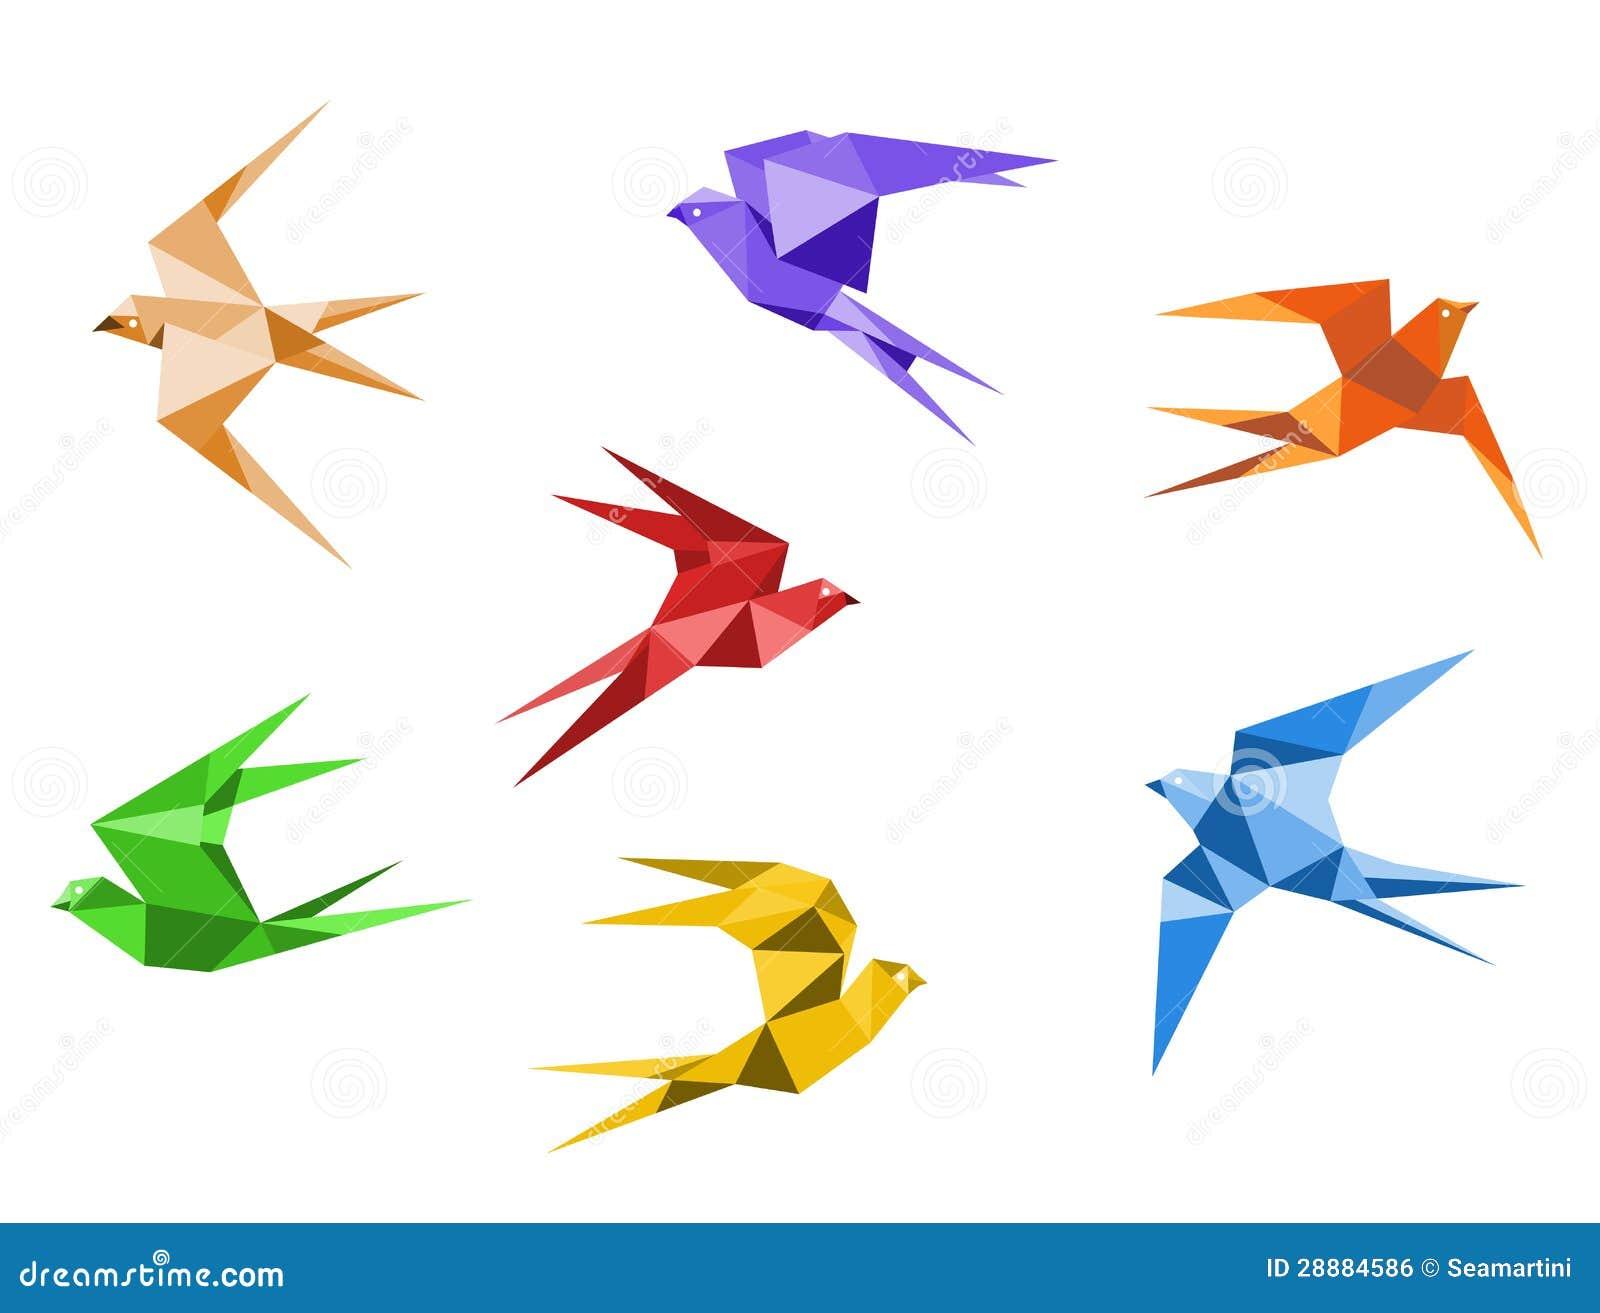 origami facile hirondelle